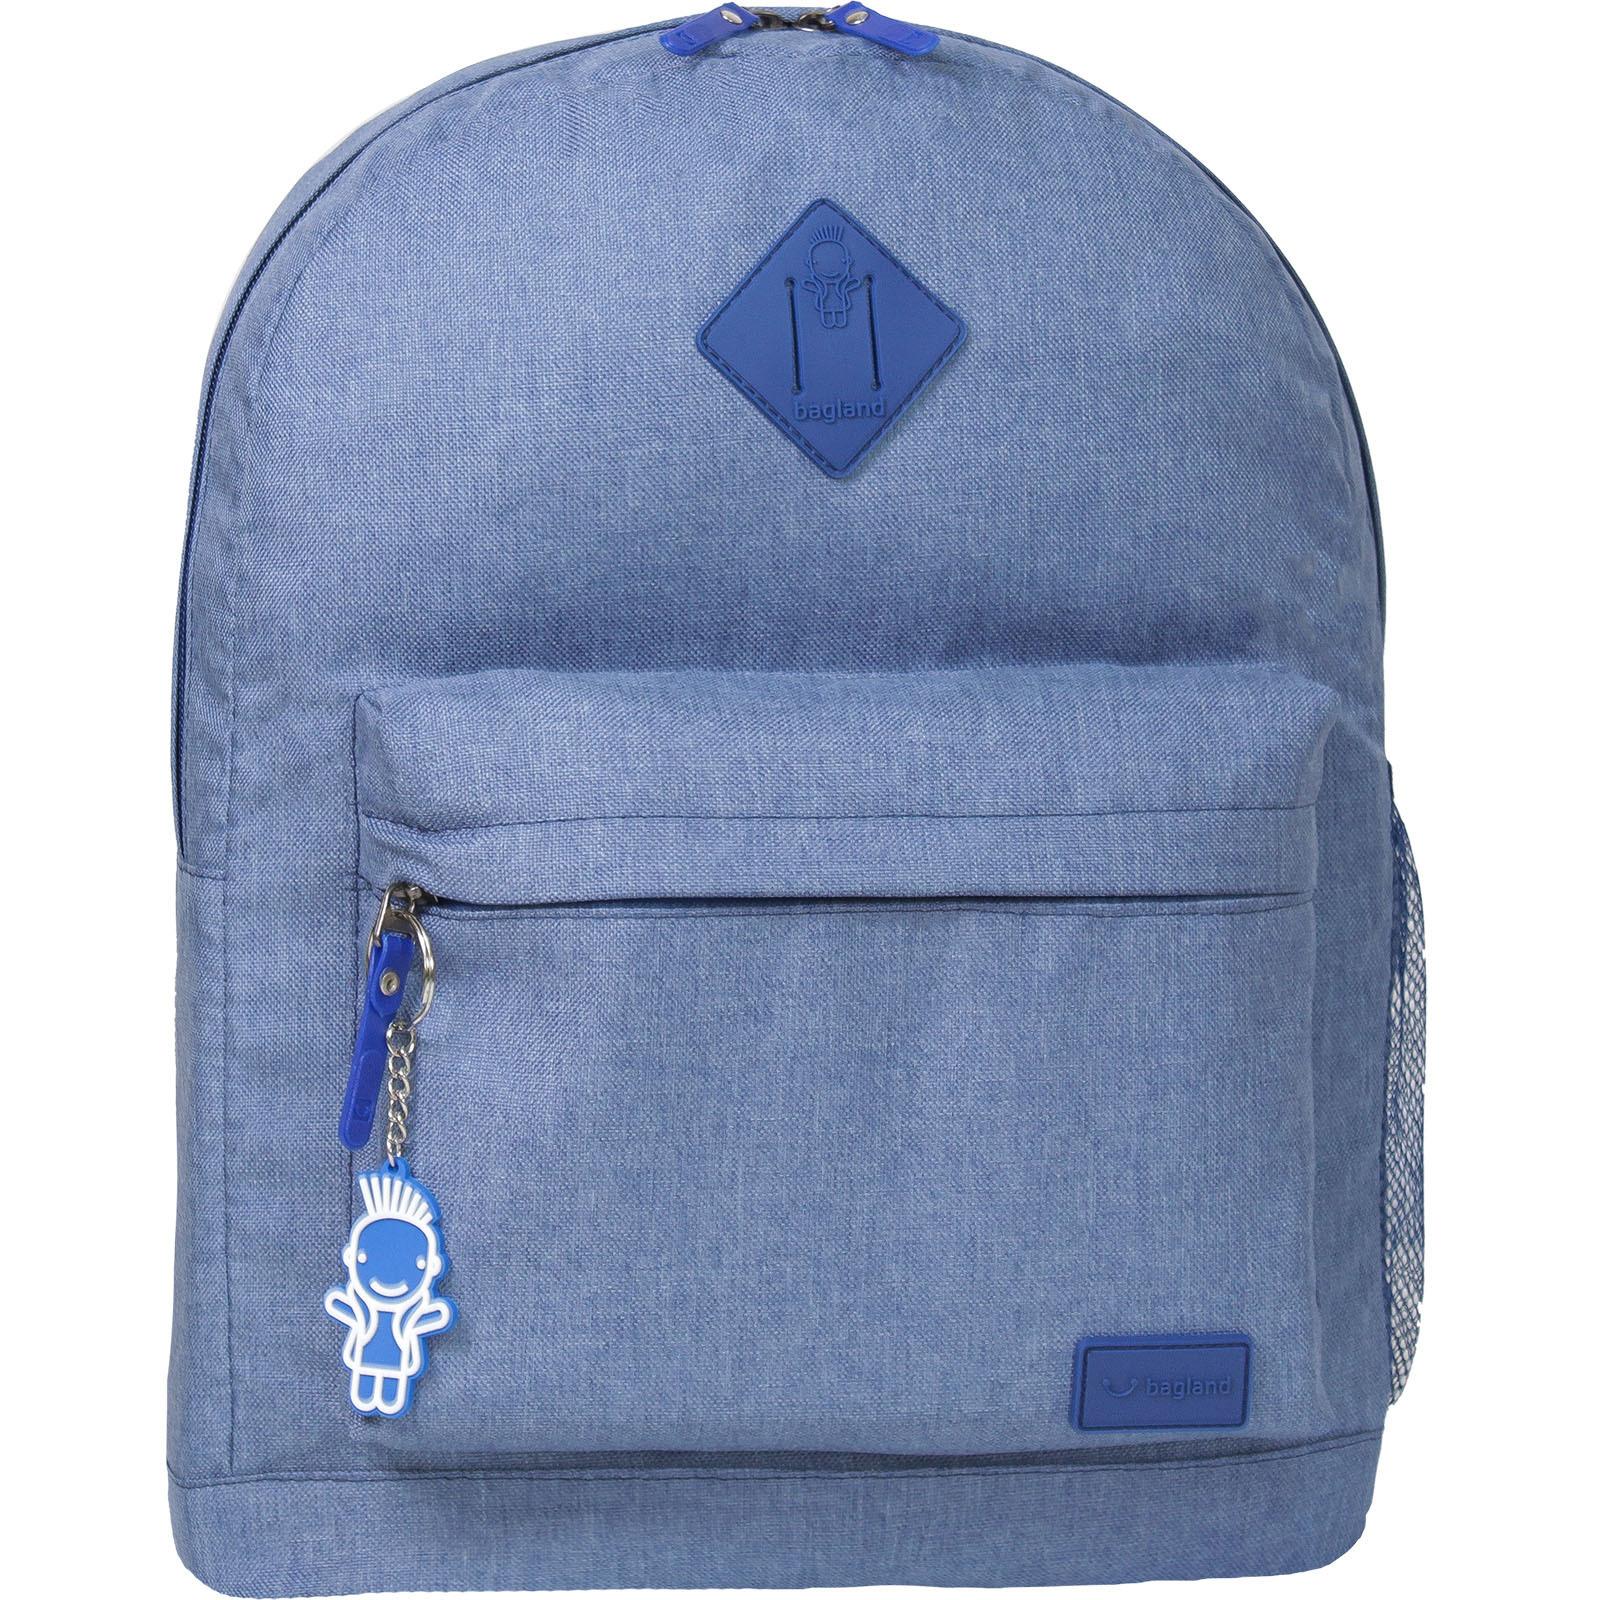 Городские рюкзаки Рюкзак Bagland Молодежный меланж 17 л. Синий (00533692) IMG_8839-1600.jpg